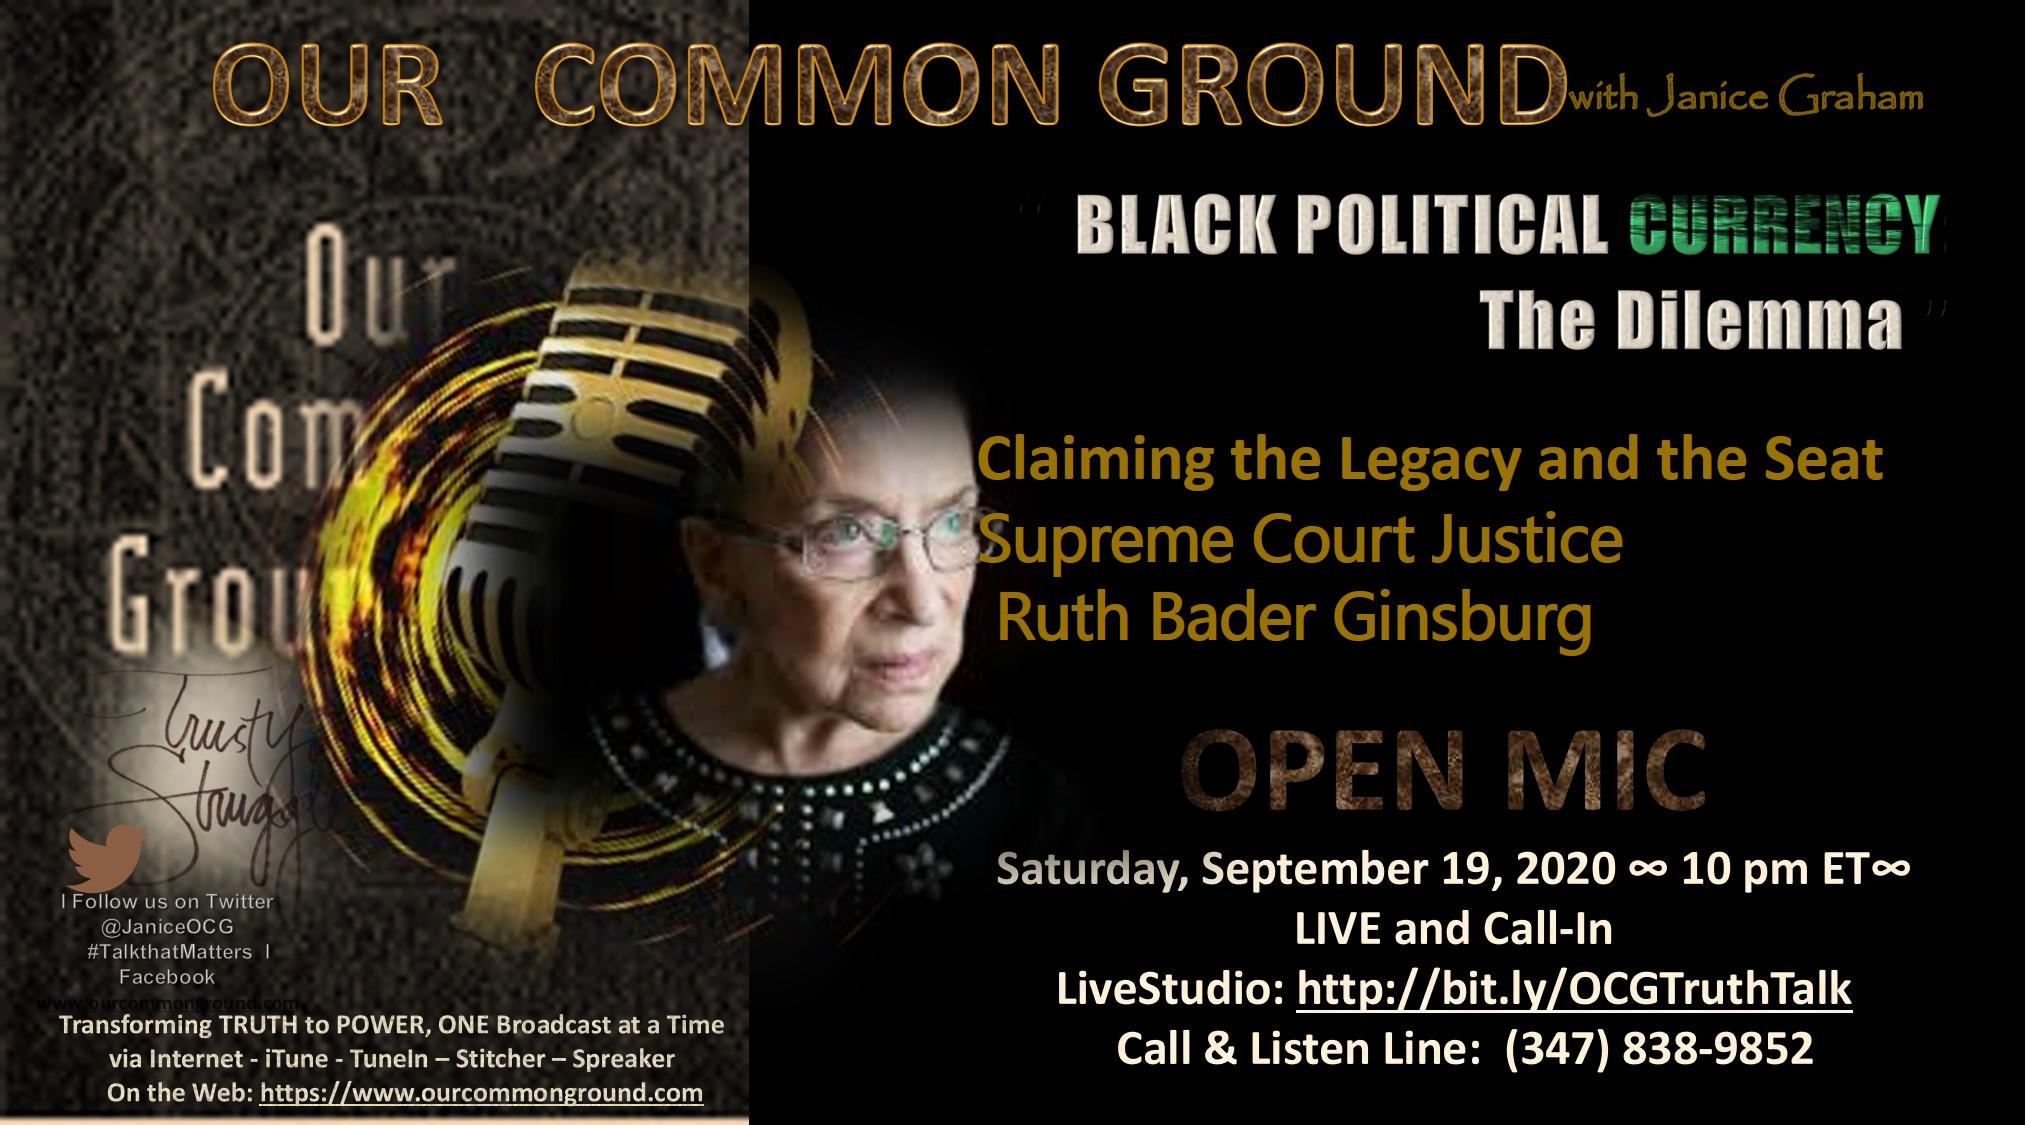 9-19-20 Black Political Ginsburg